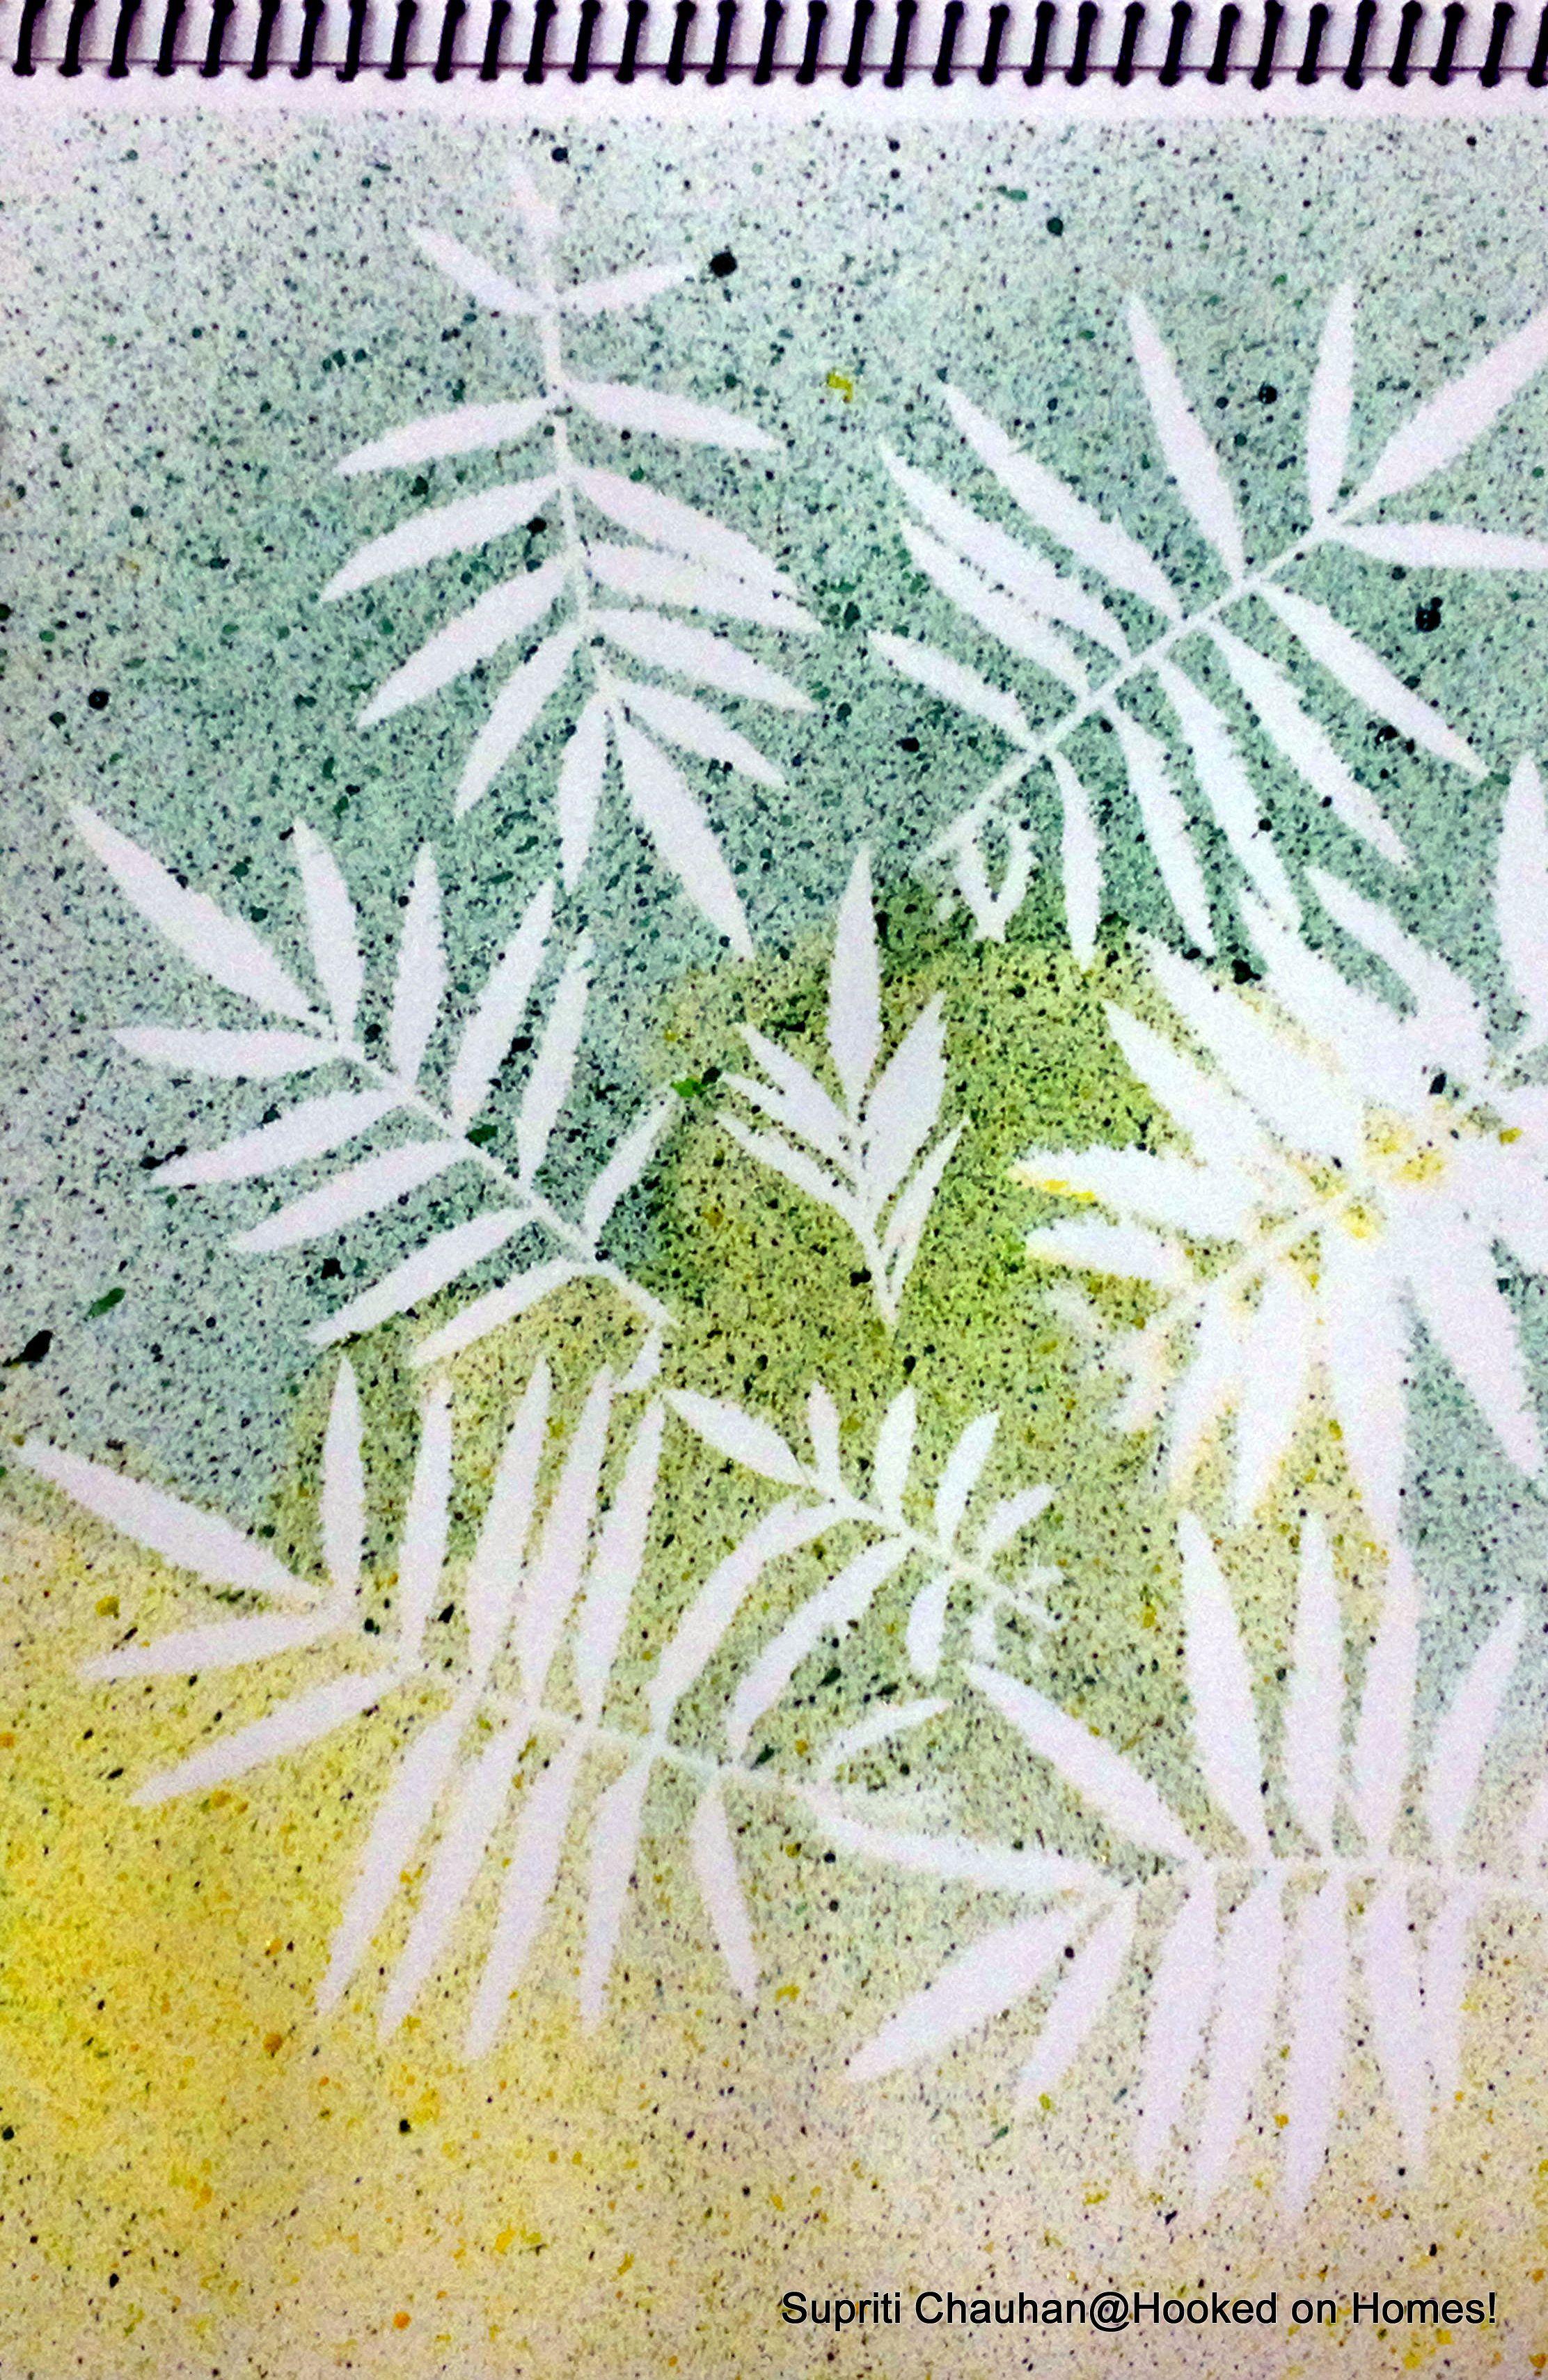 Diy Spray Painting Hooked On Homes Diy Spray Paint Diy Sprays Spray Painting